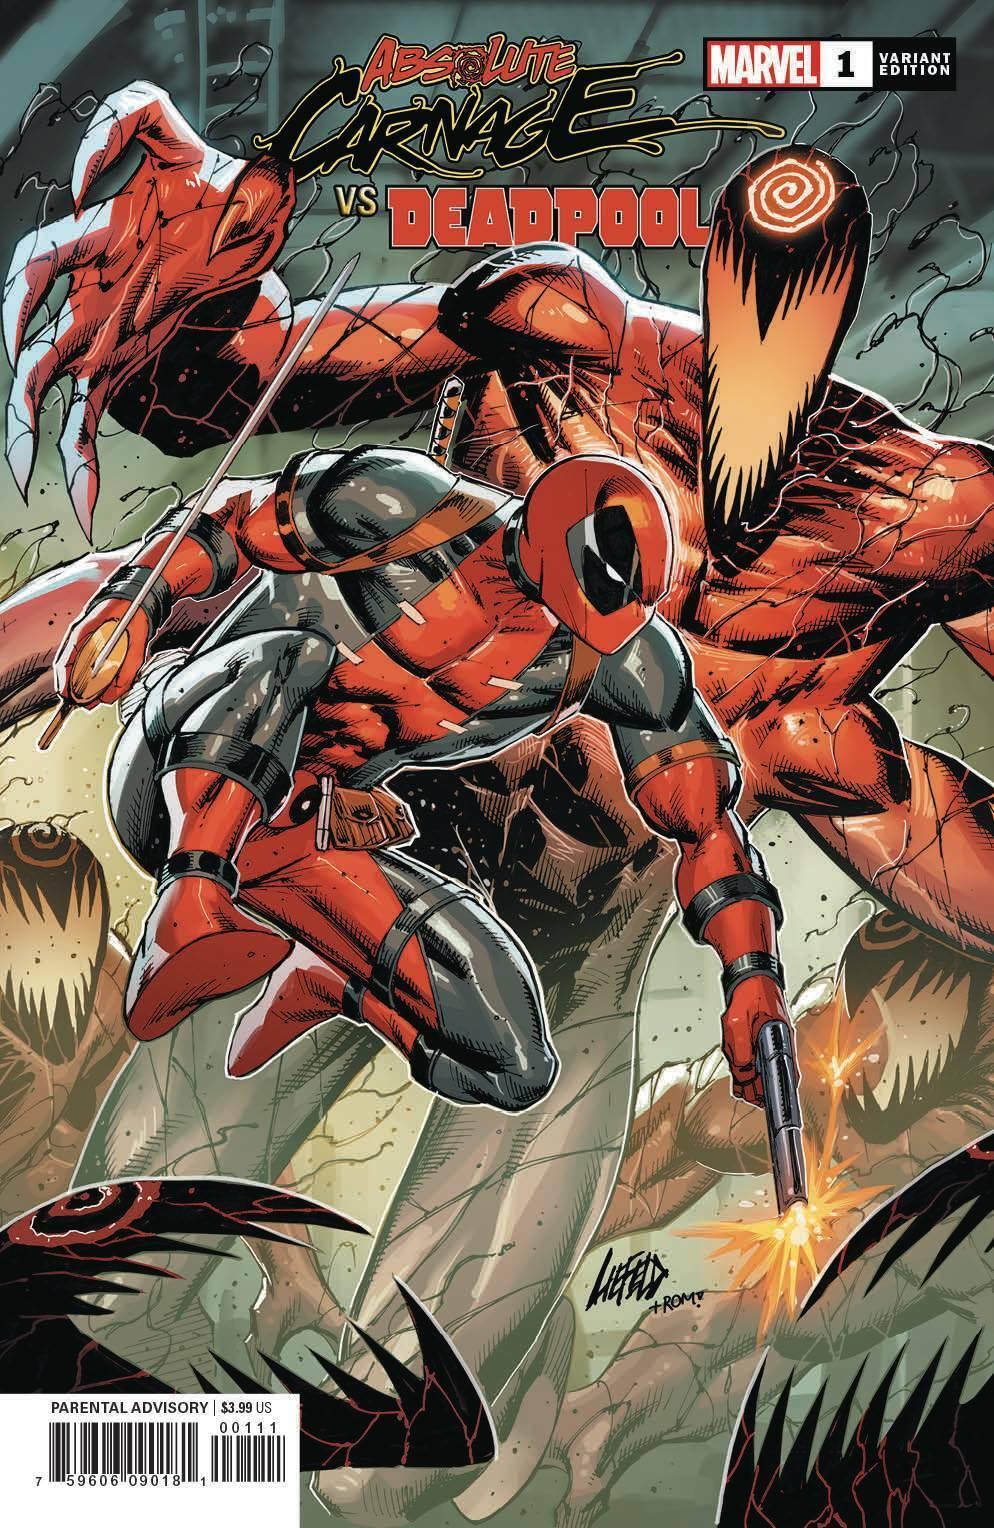 ABSOLUTE CARNAGE VS DEADPOOL #1 2 3Marvel ComicsSelect OptionNM Books